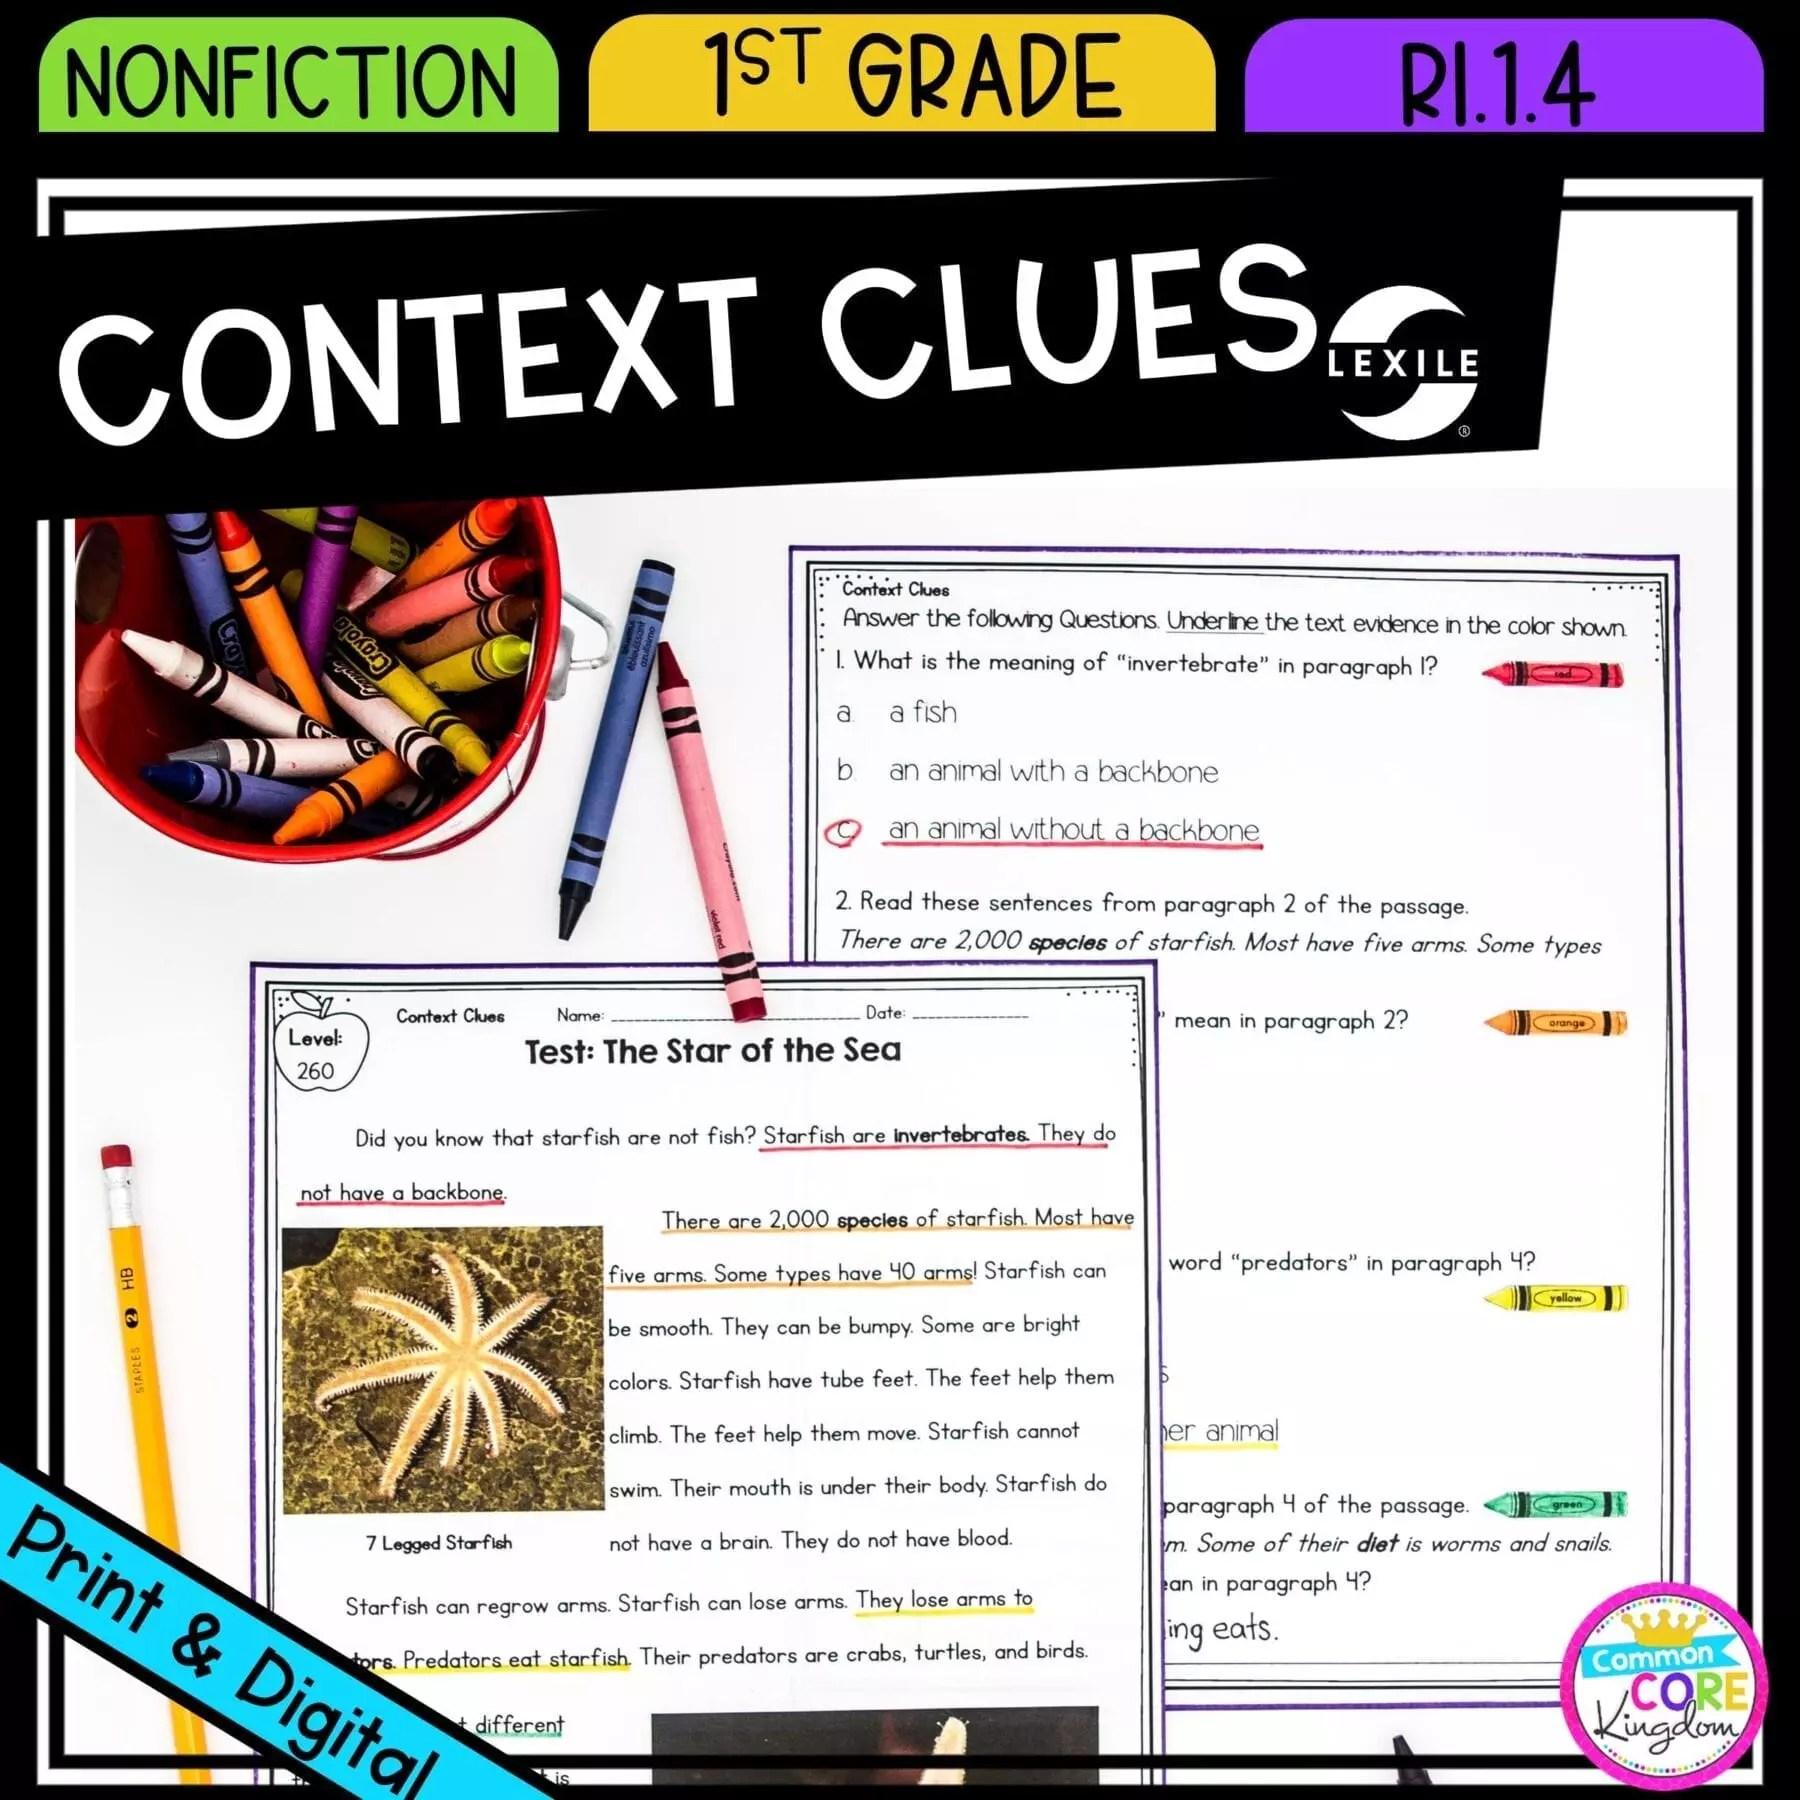 medium resolution of Context Clues in Nonfiction - 1st Grade - RI.1.4 Printable \u0026 Digital Google  Slides Distance Learning   Common Core Kingdom